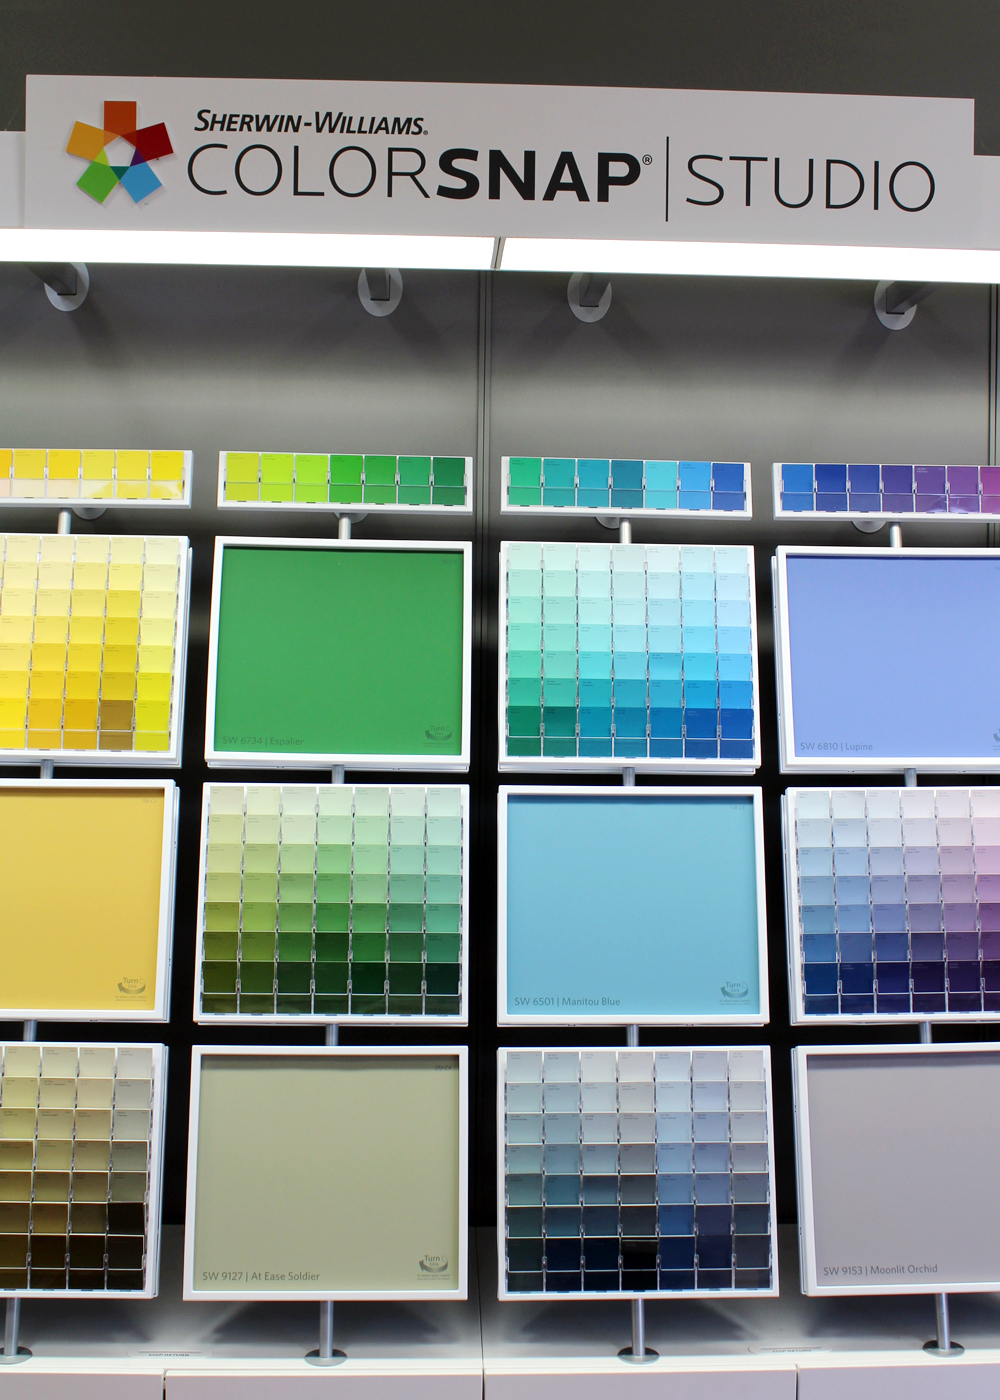 Sherwin-Williams in store ColorSnap Studio